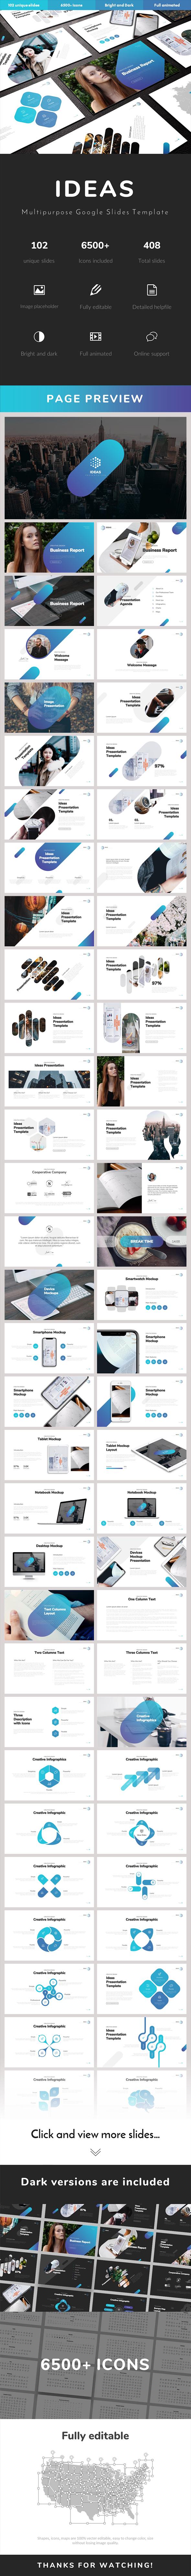 Ideas Multipurpose Google Slides Template - Google Slides Presentation Templates